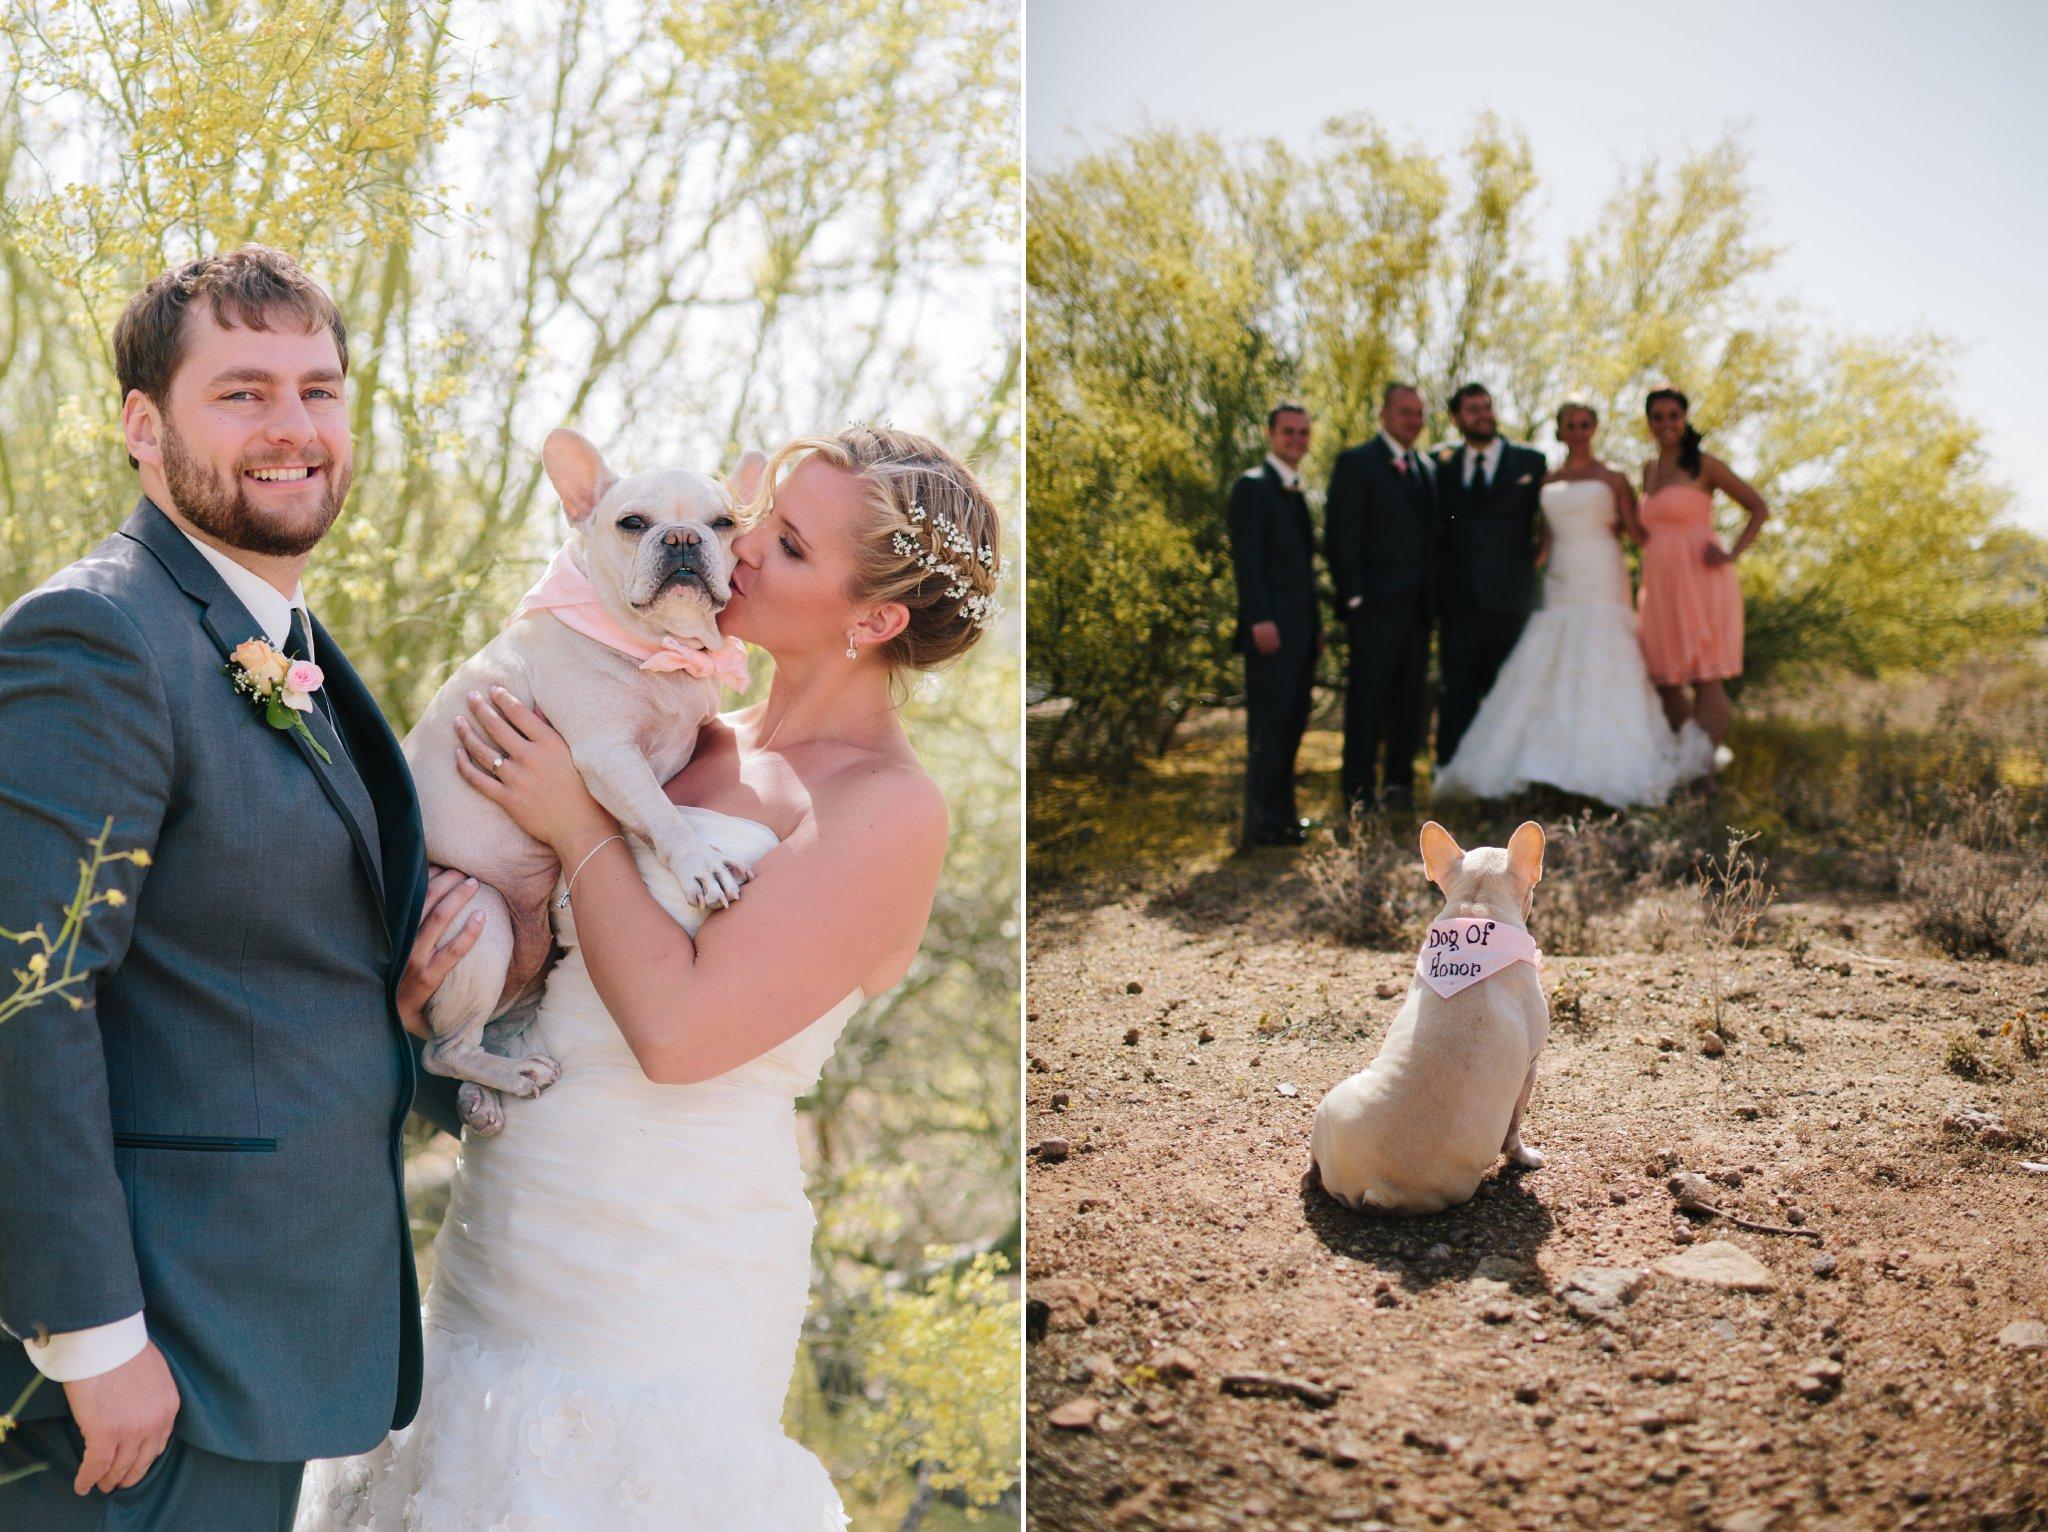 bulldog dog of honor looking at wedding party in Arizona desert